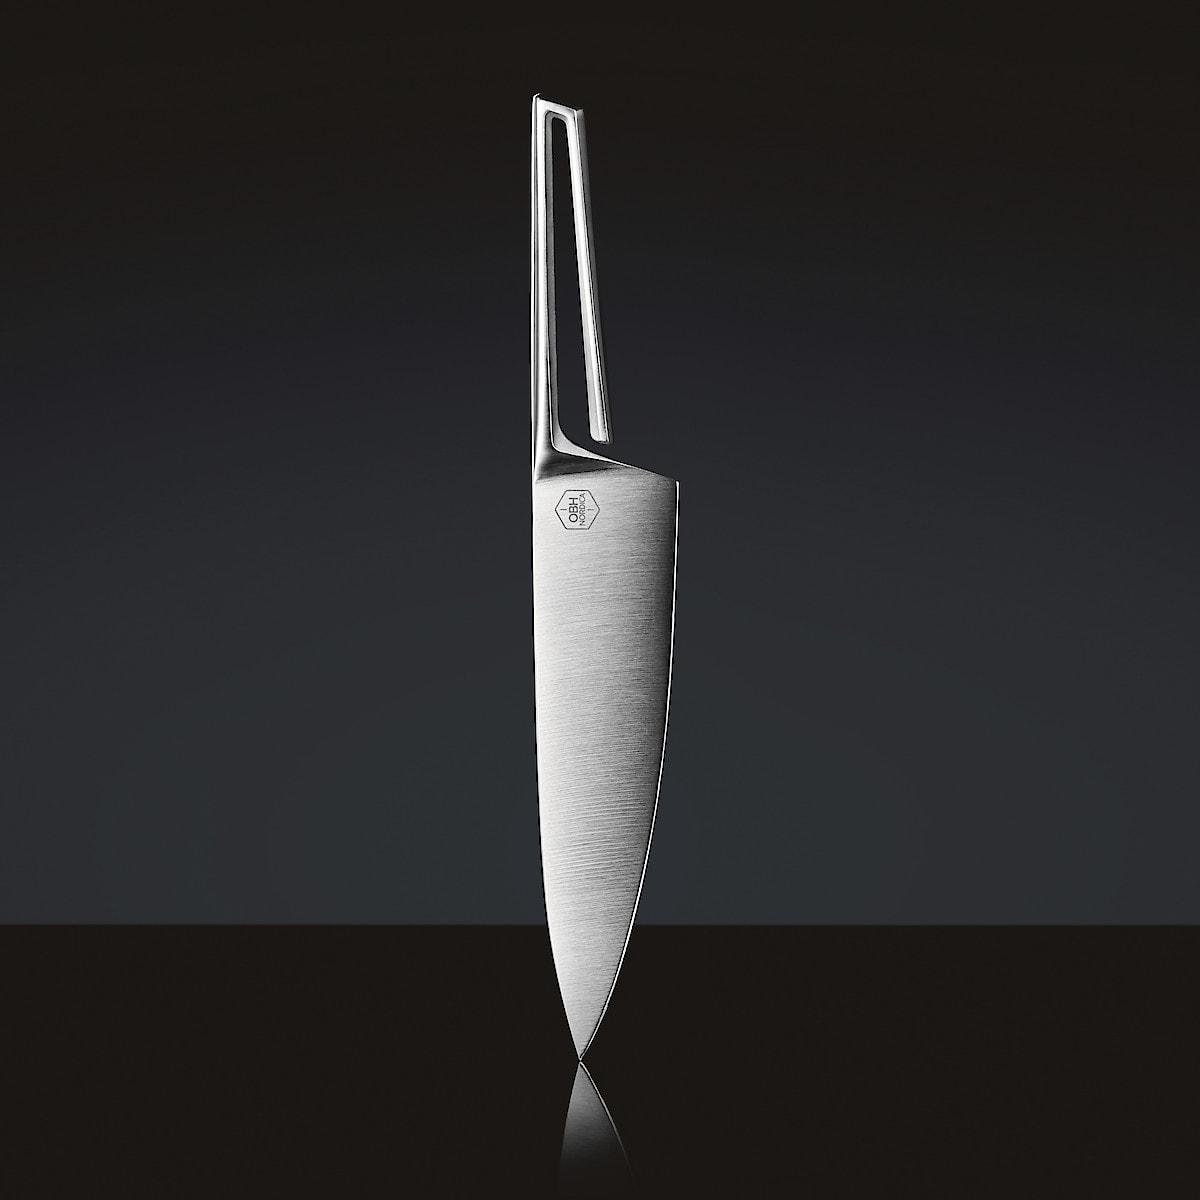 Keittiöveitsi Arctic Chef's Knife OBH Nordica 20 cm